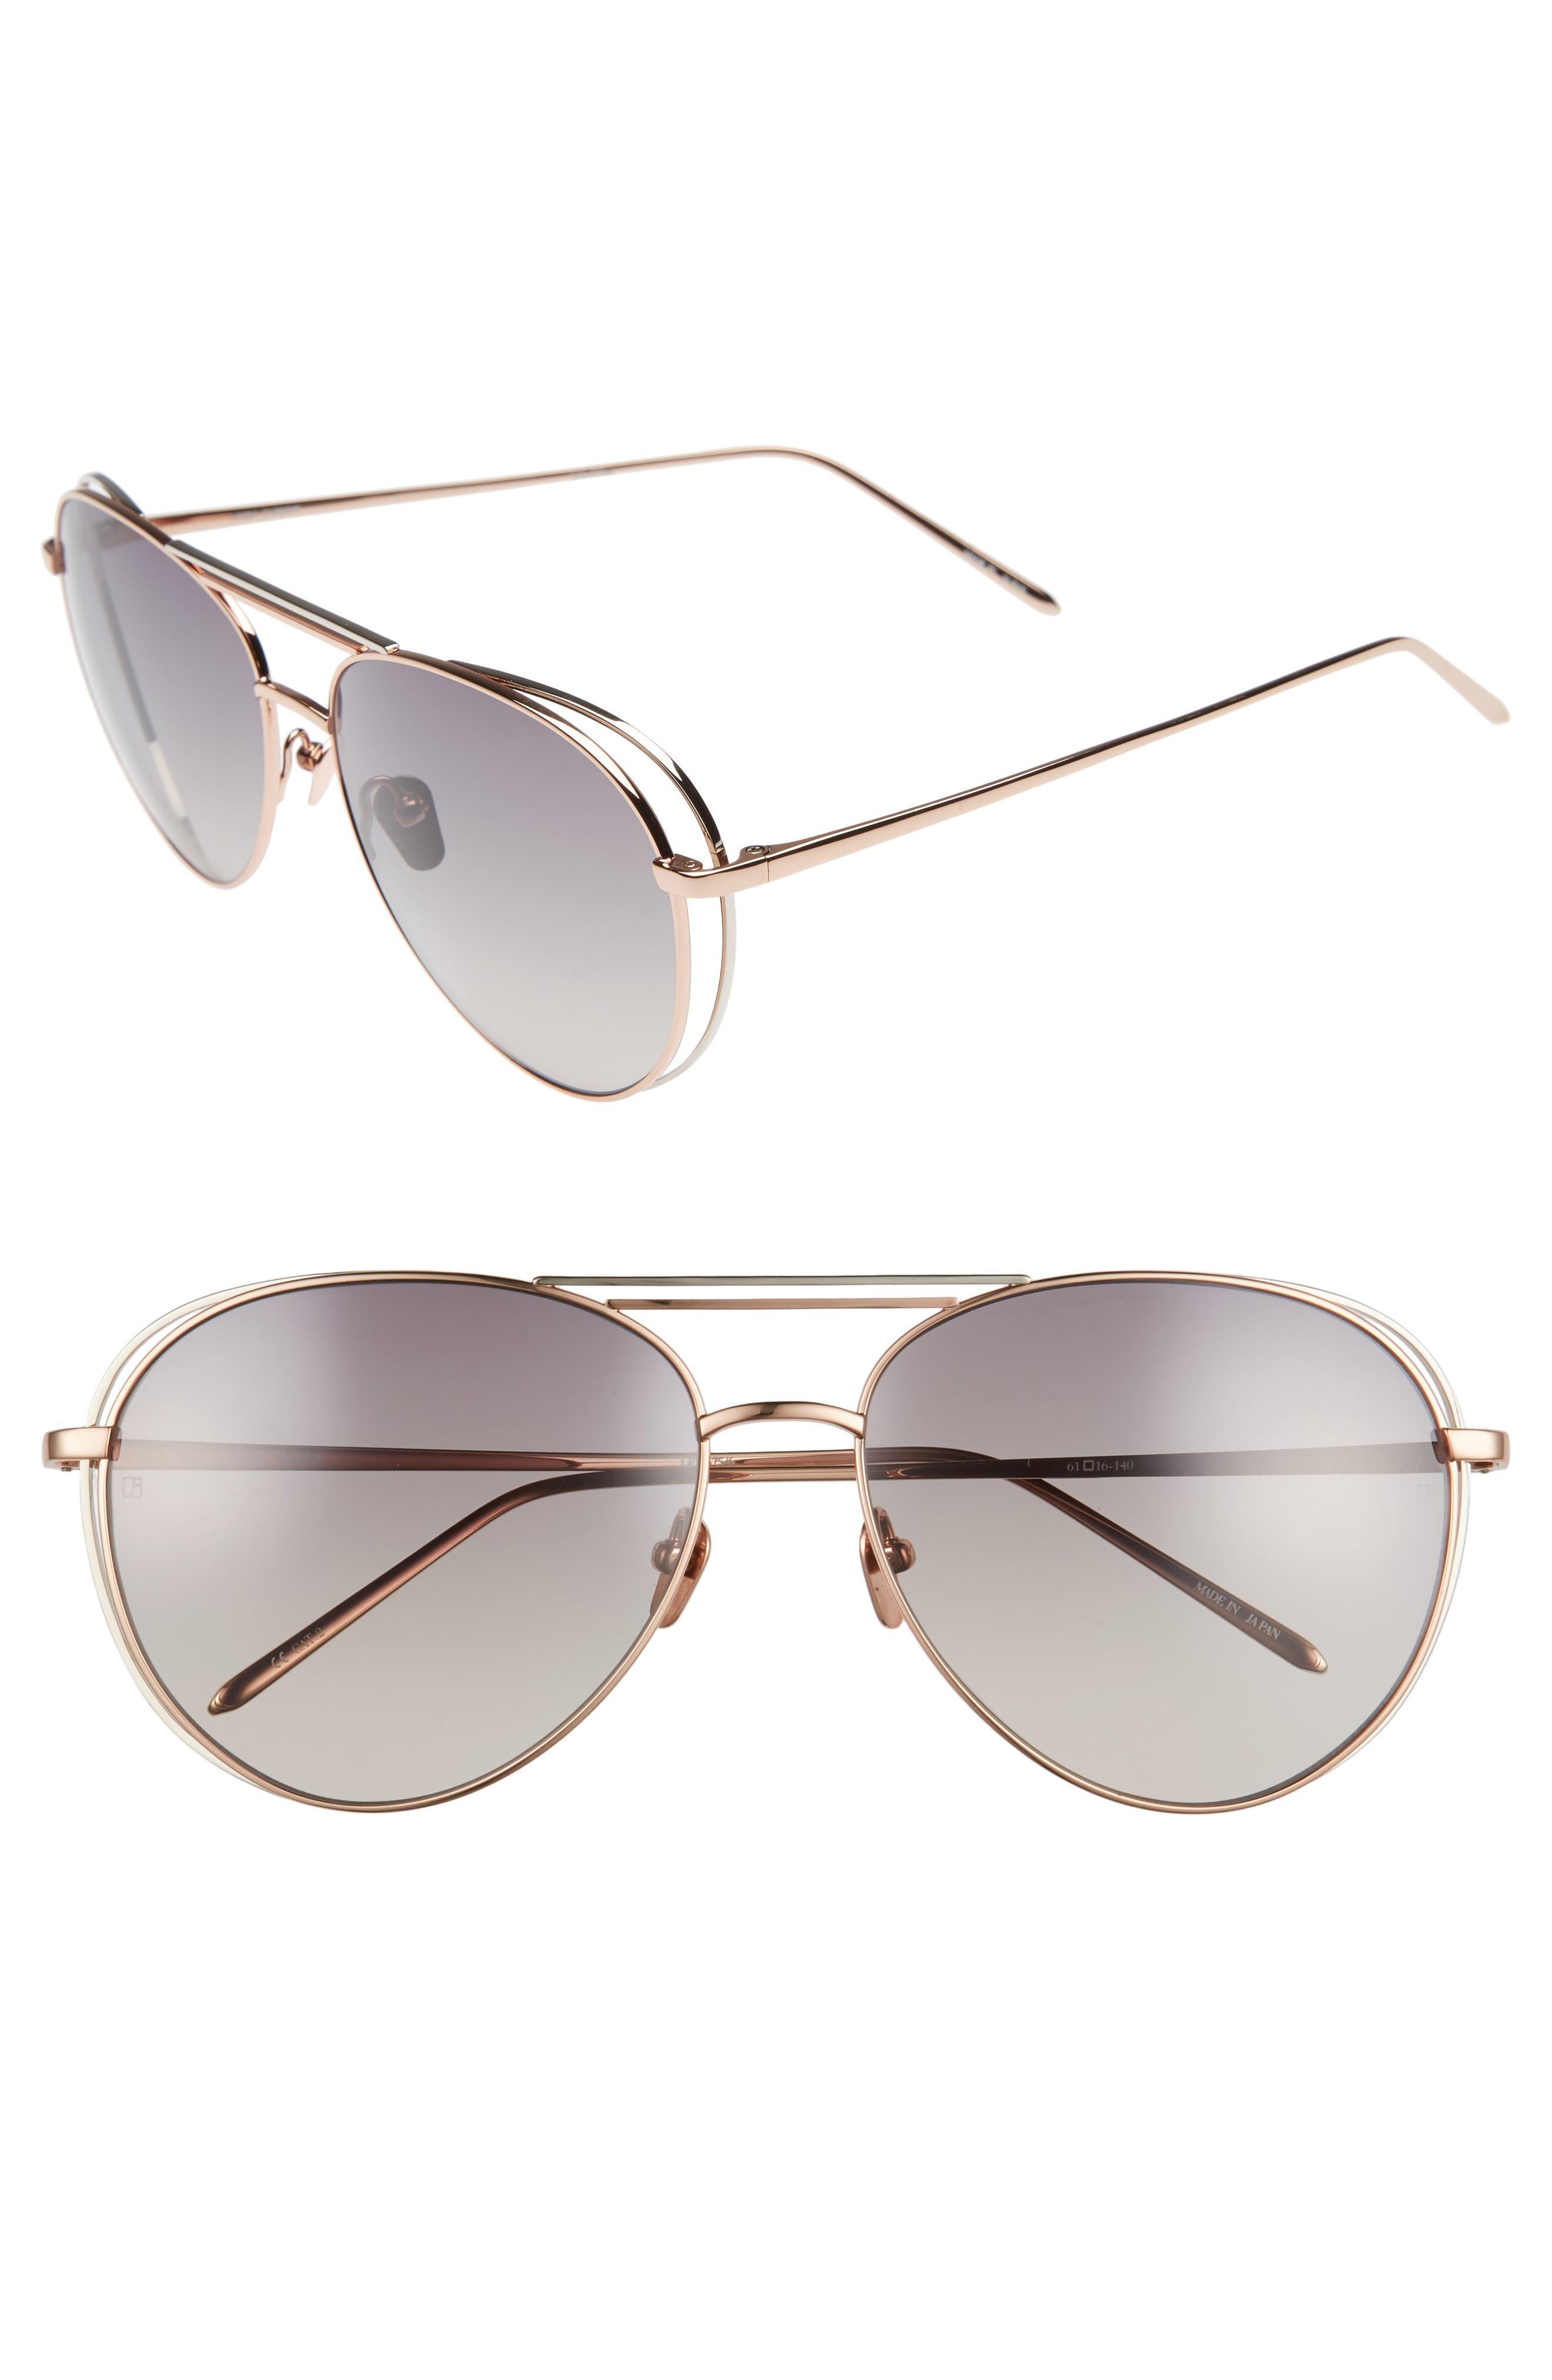 61mm 18 Karat Gold Aviator Sunglasses,                             Main thumbnail 3, color,